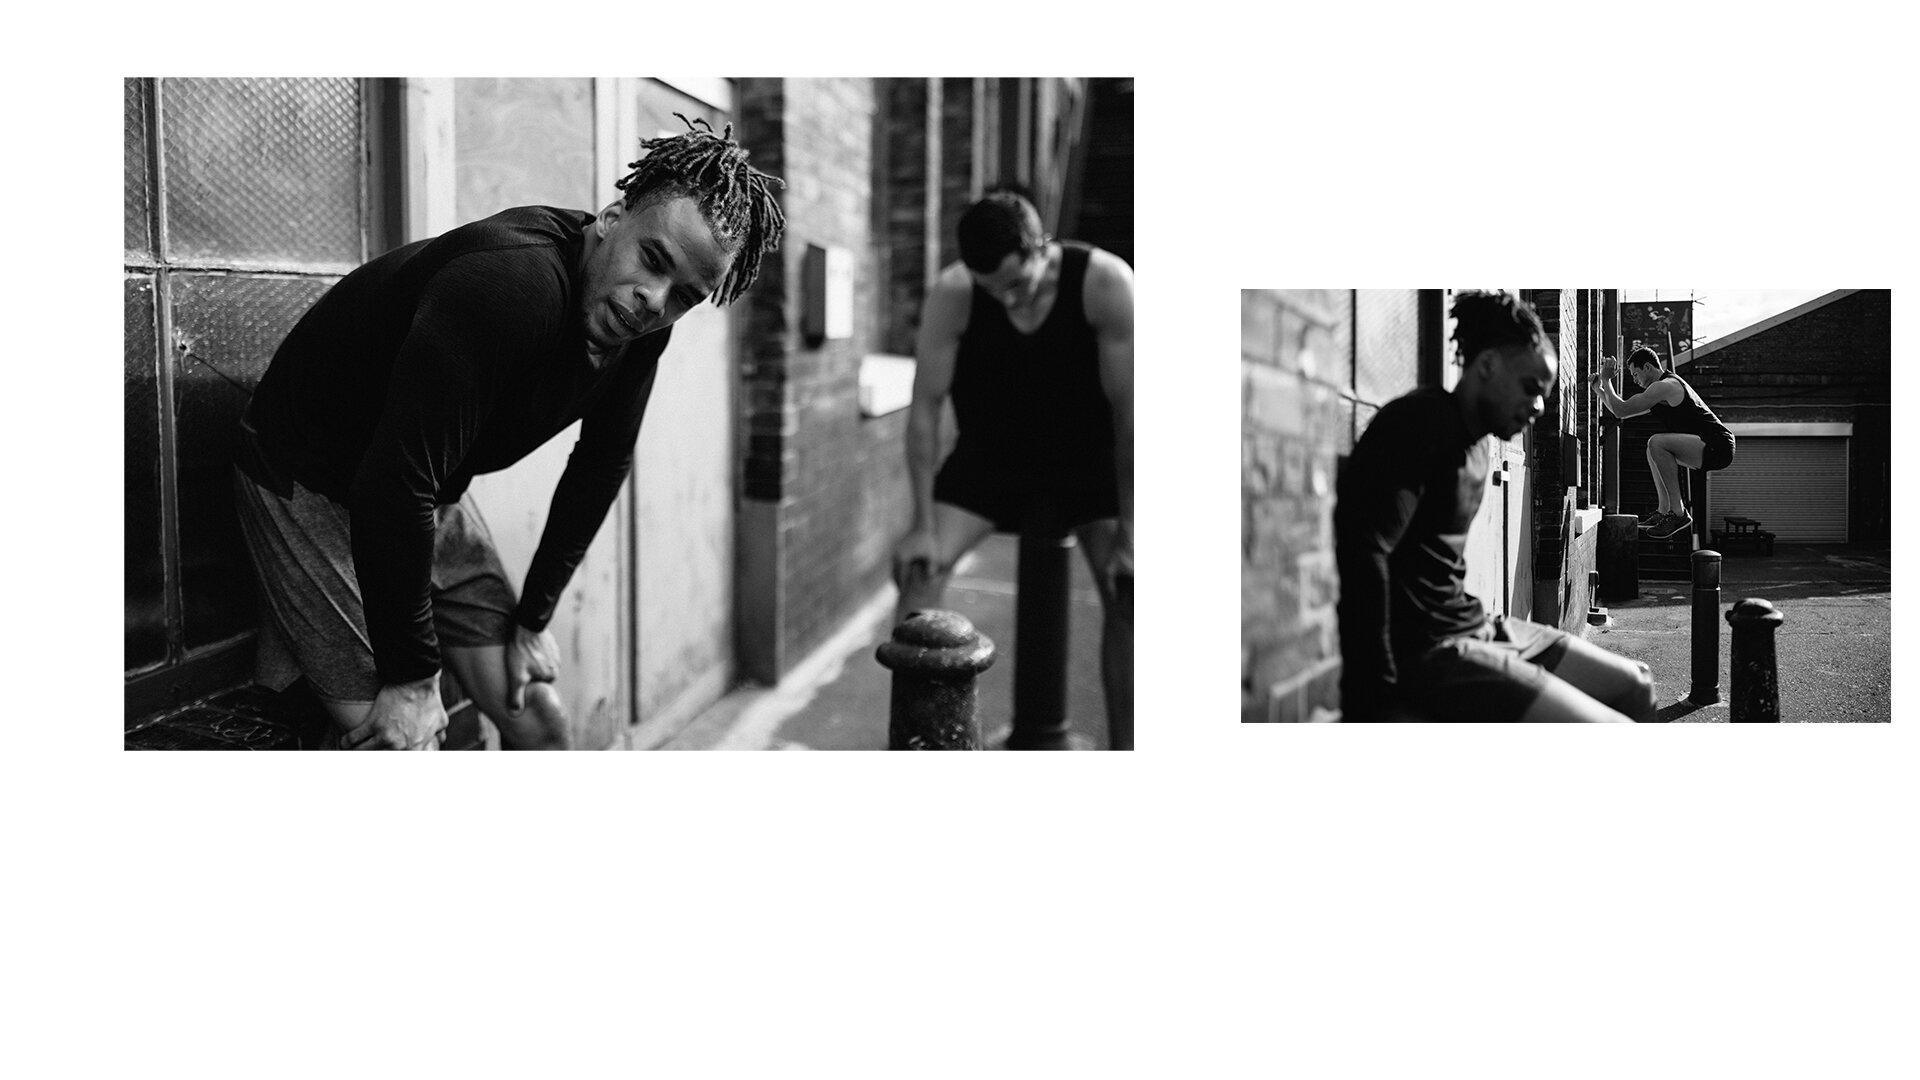 toby-butler-tobybutlerphoto-photography-fitness-lifestyle-lifestylephotographer-london-city-body-lululemon-yoga-stretch-emotion-physical-5.jpg